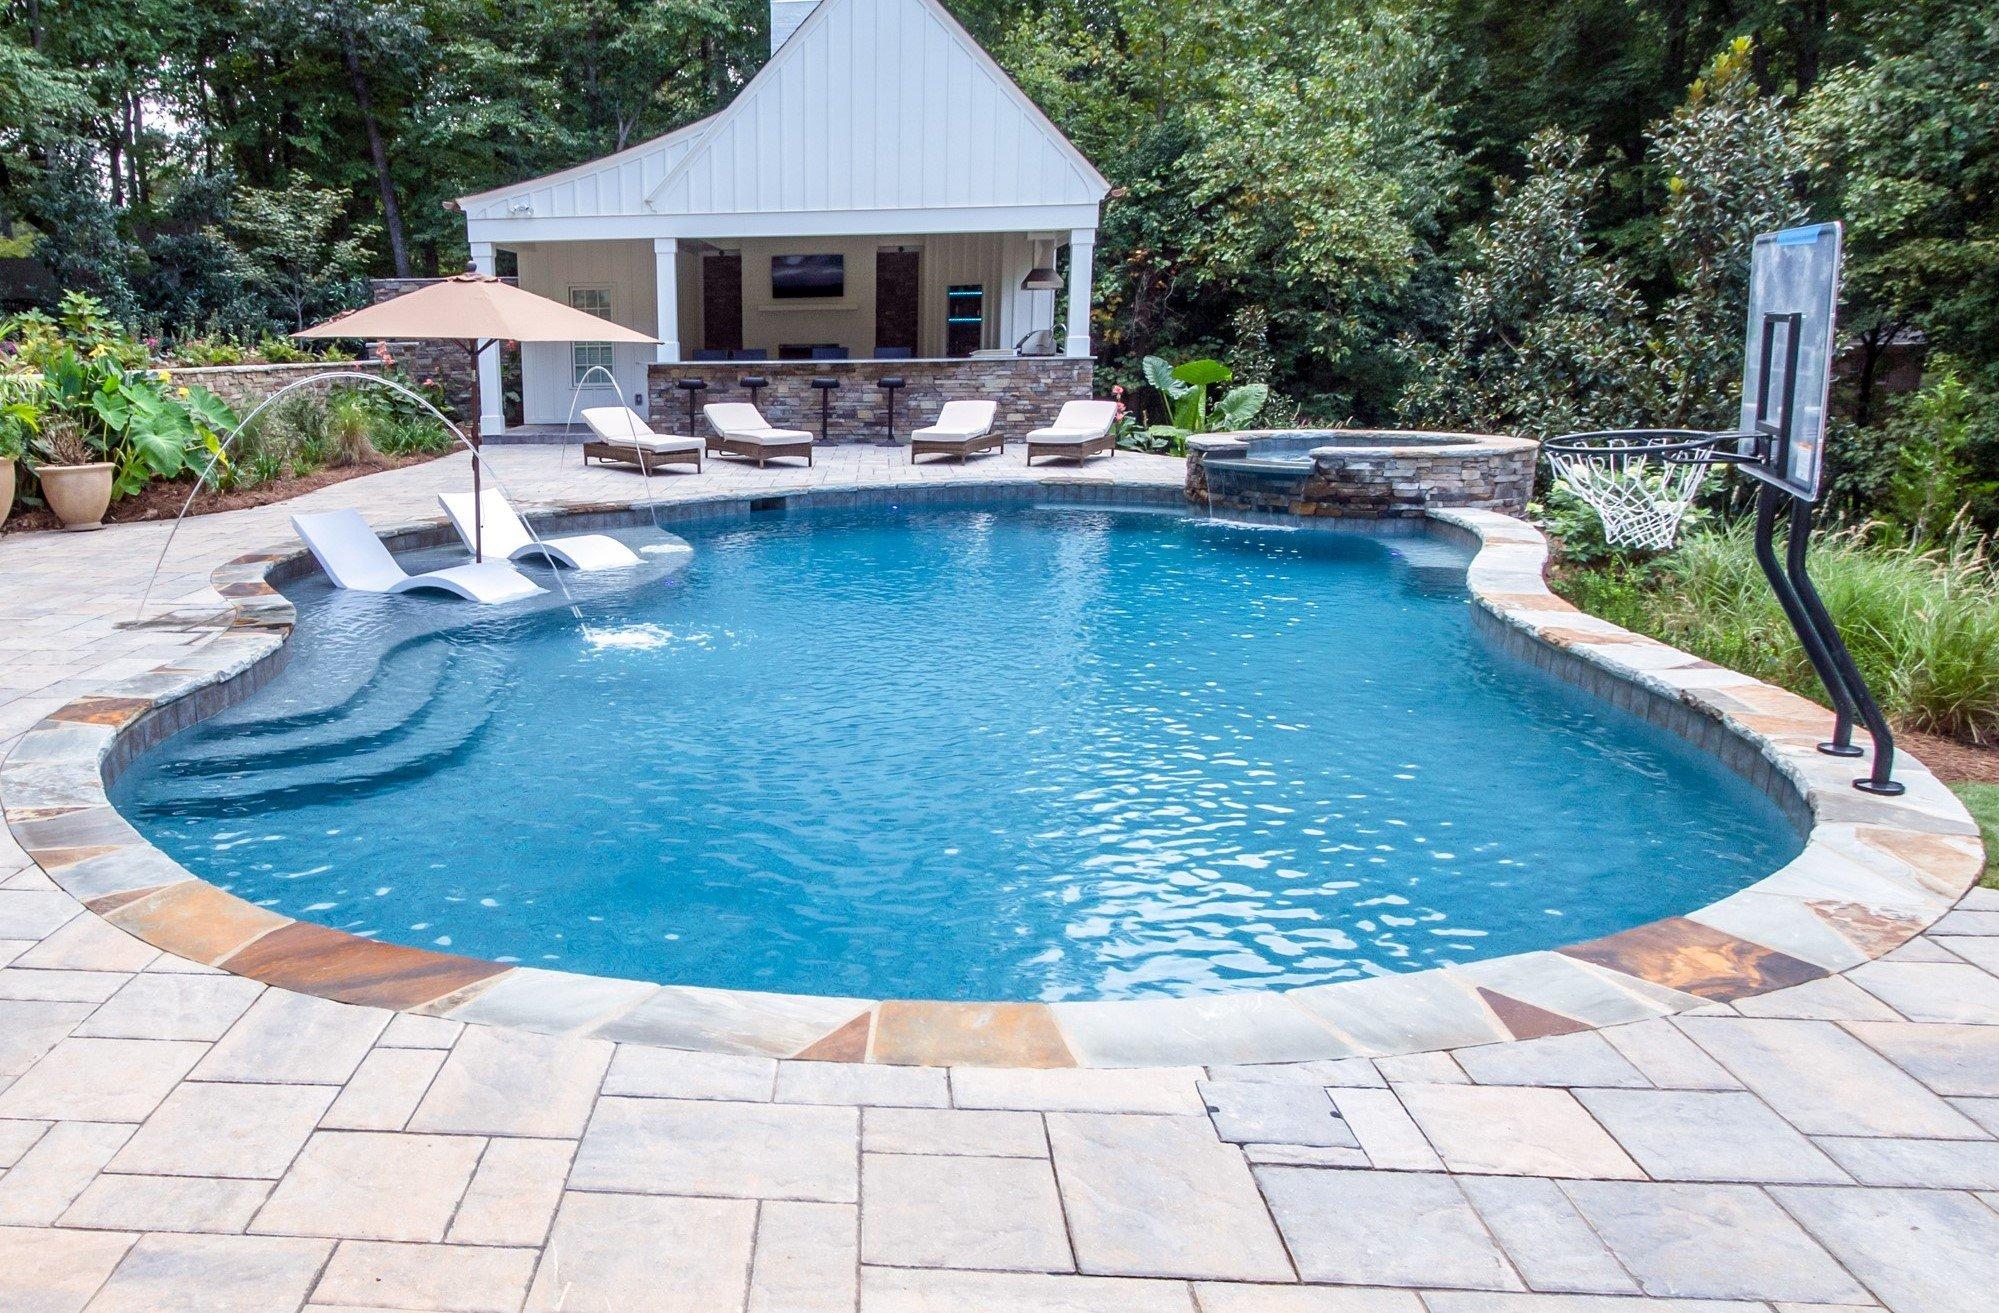 gunite-pool-with-tanning-ledge